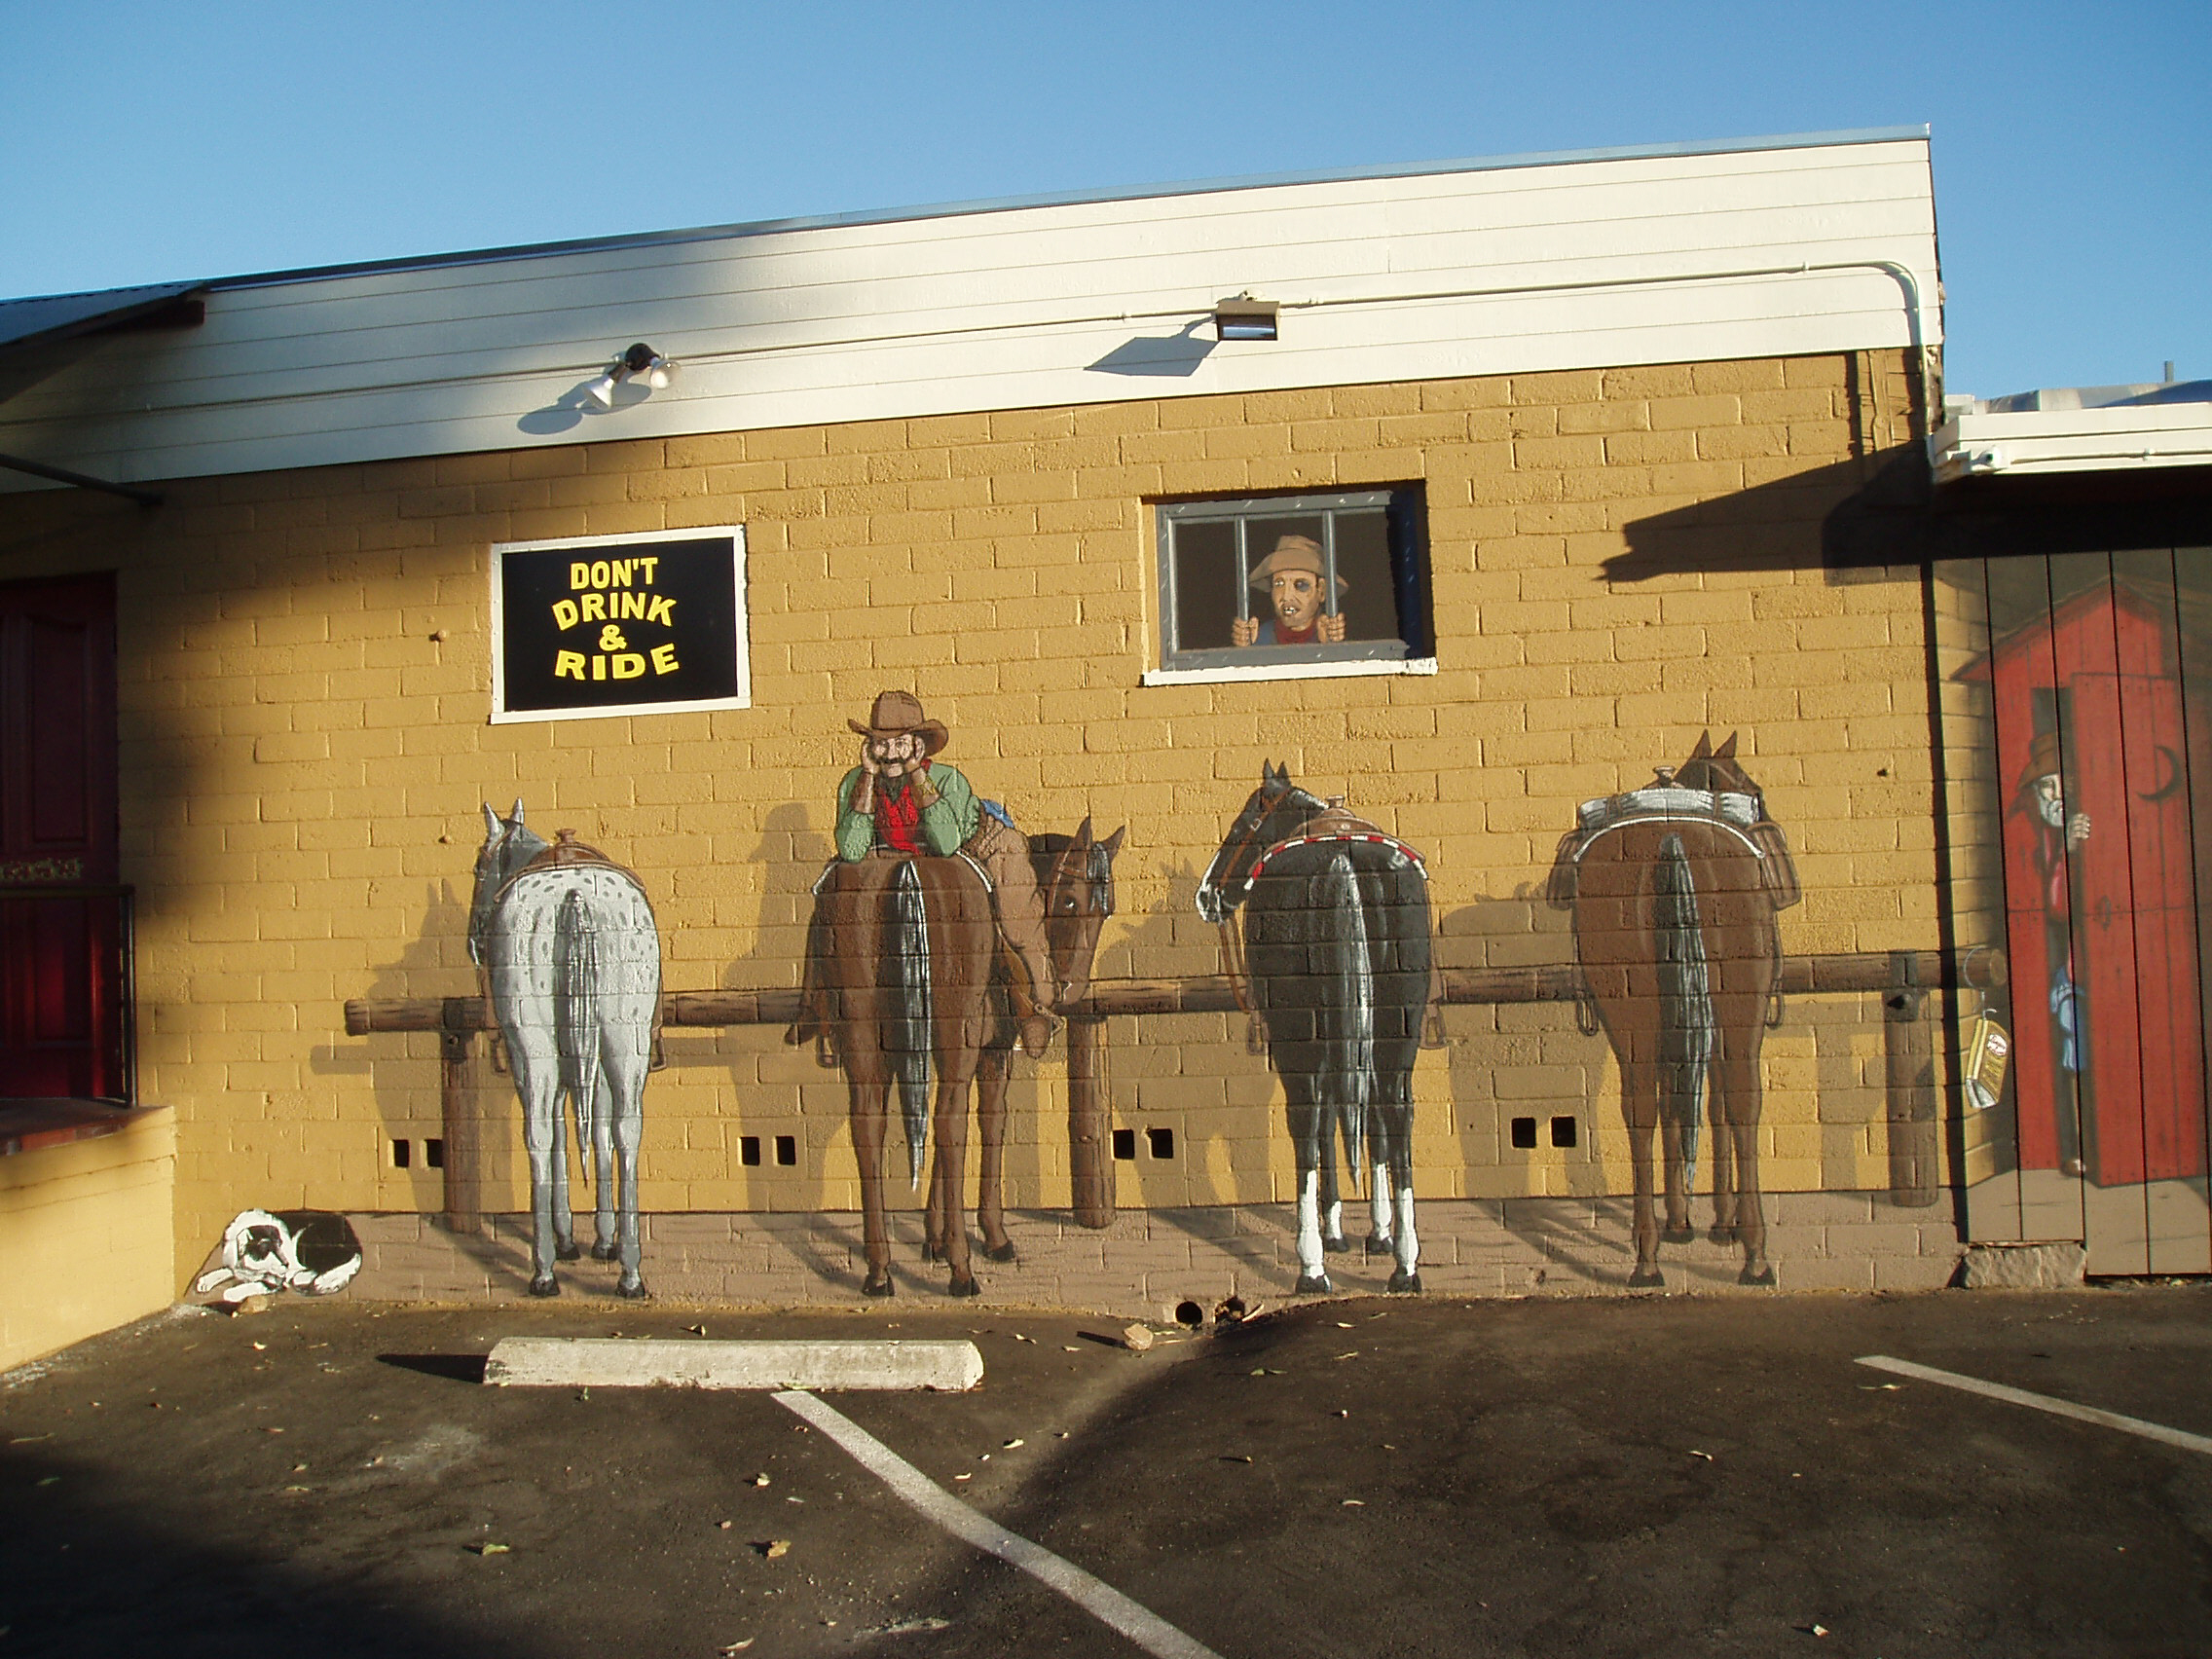 Western Mural Wagon Wheel Restaurant exterior Santee California 19.jpg